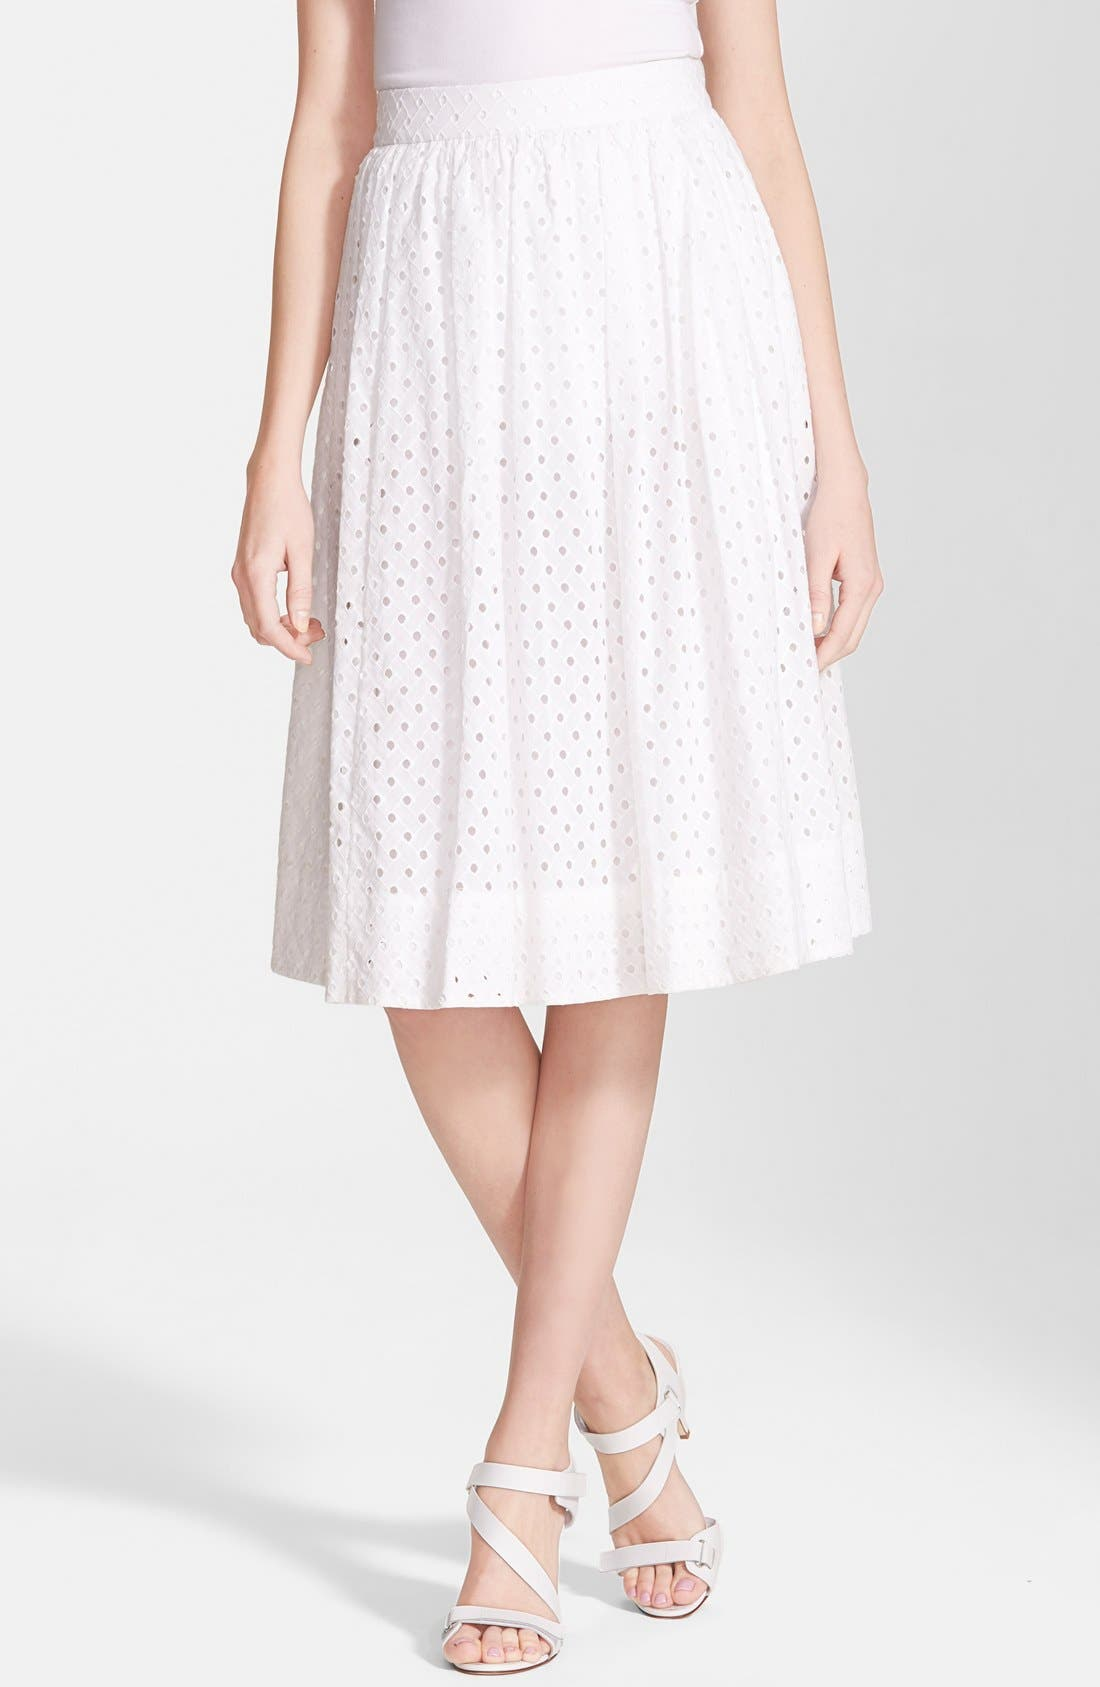 Alternate Image 1 Selected - kate spade new york pleated eyelet a-line skirt